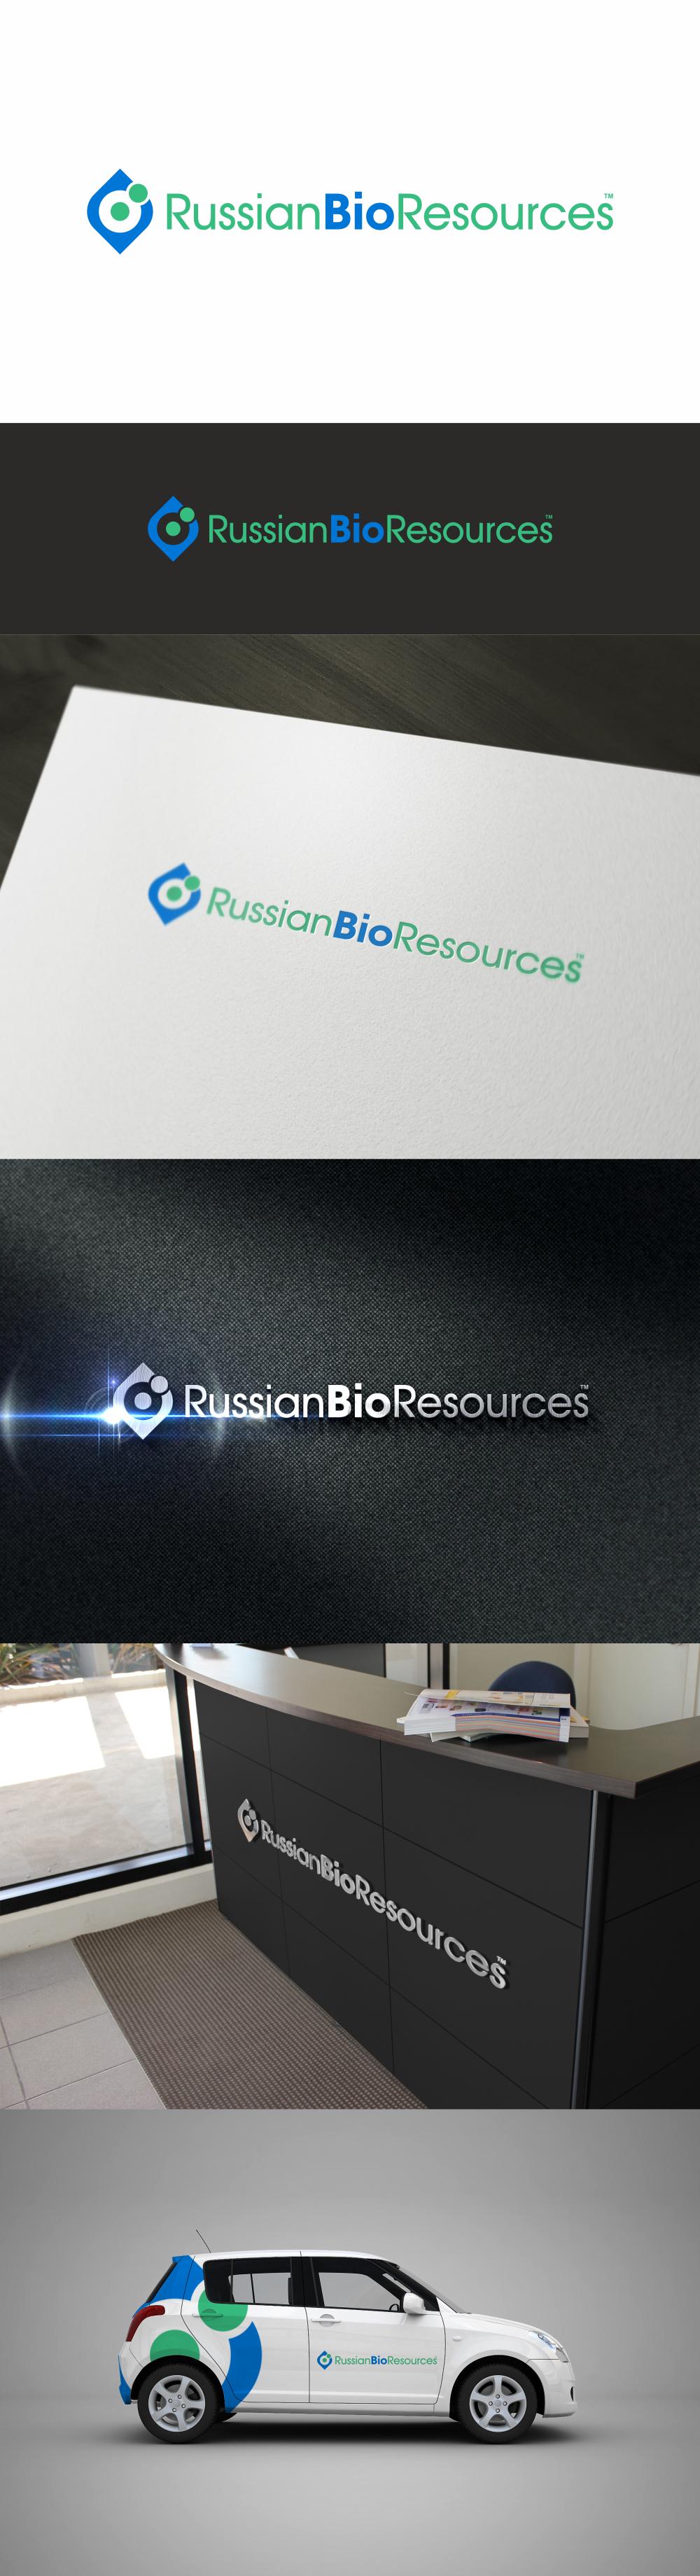 Разработка логотипа для компании «Русские Био Ресурсы» фото f_98058fc6fabb9c26.jpg